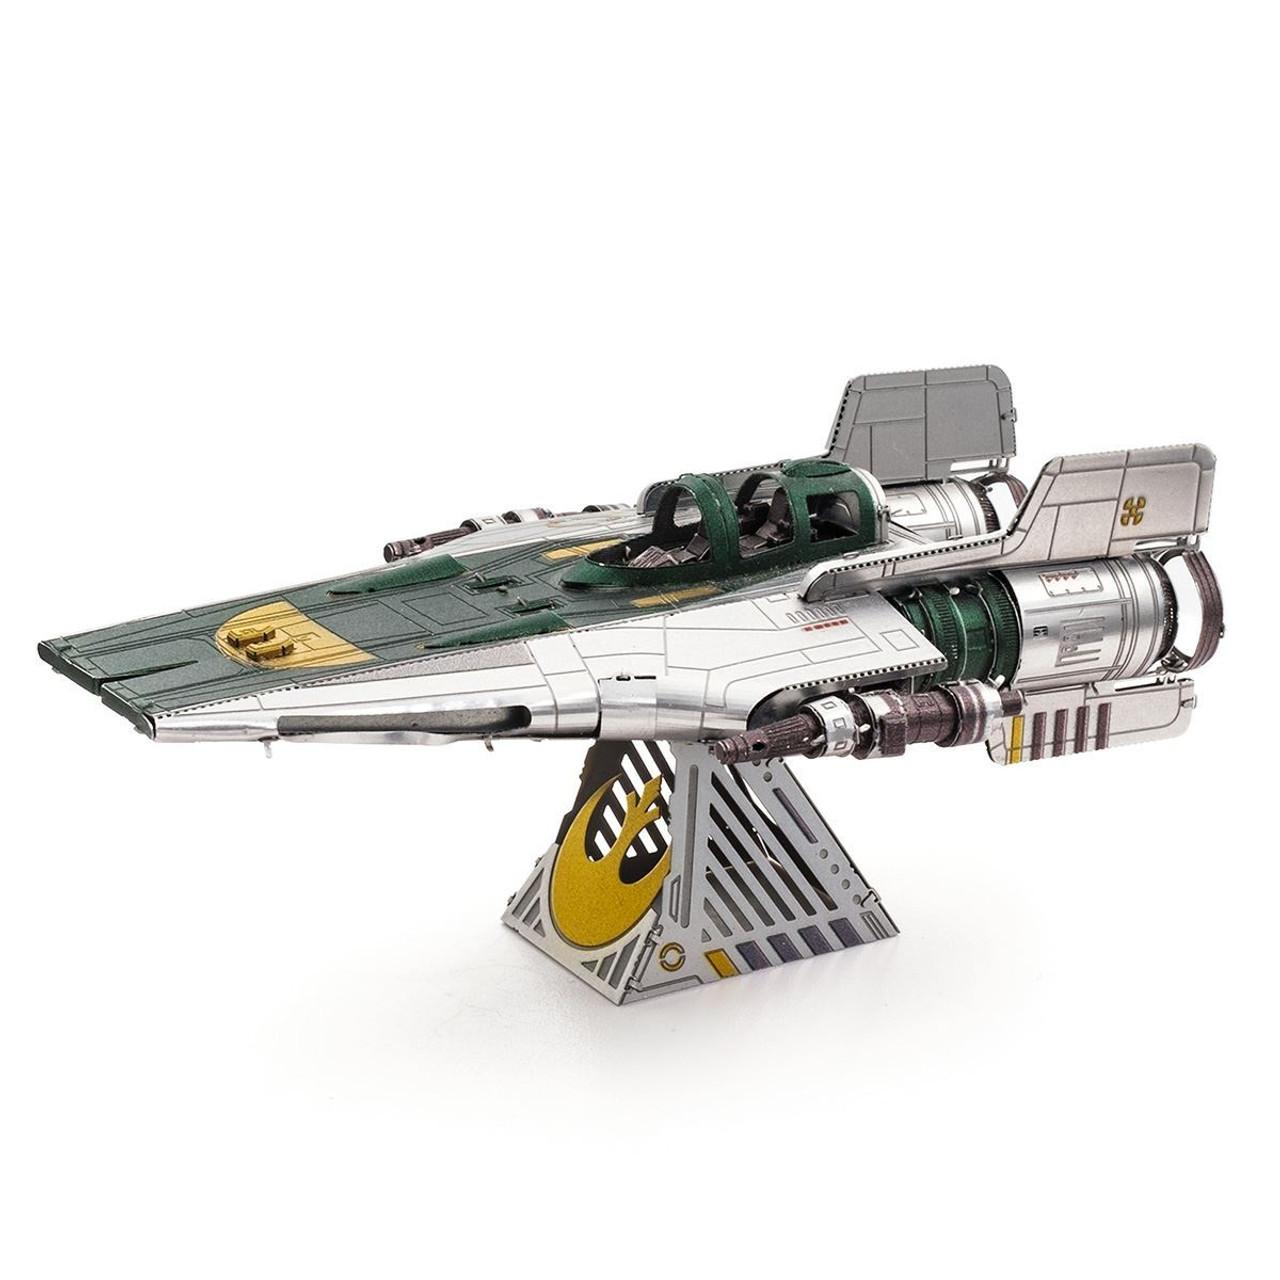 Fascinations Metal Earth Star Wars Last Jedi Resistance Bomber Vehicle Model Kit